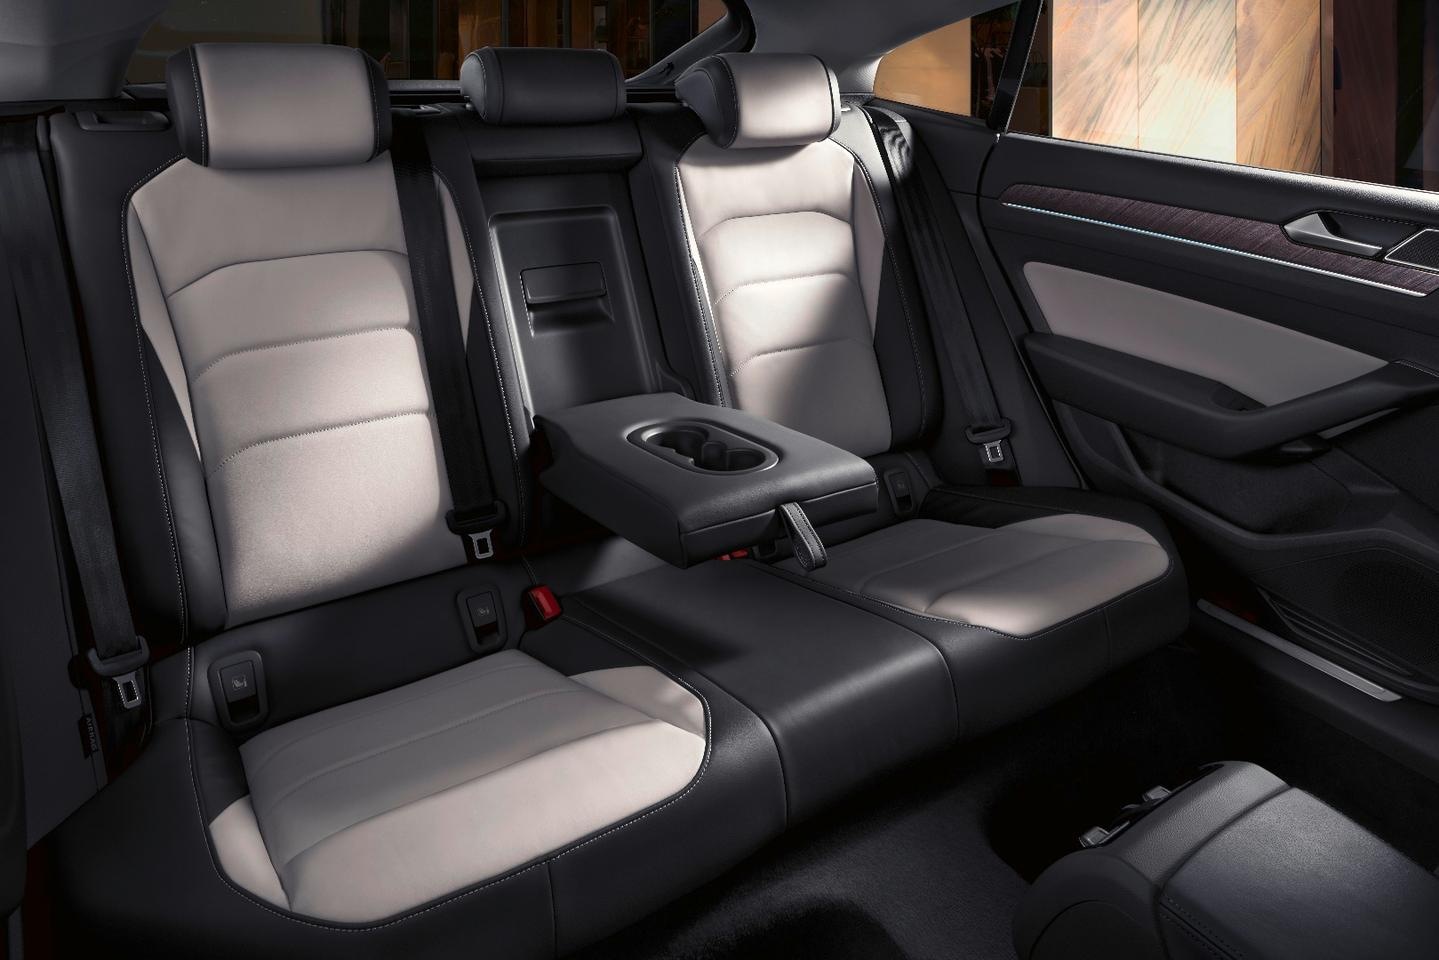 The back seats in the Volkswagen Arteon